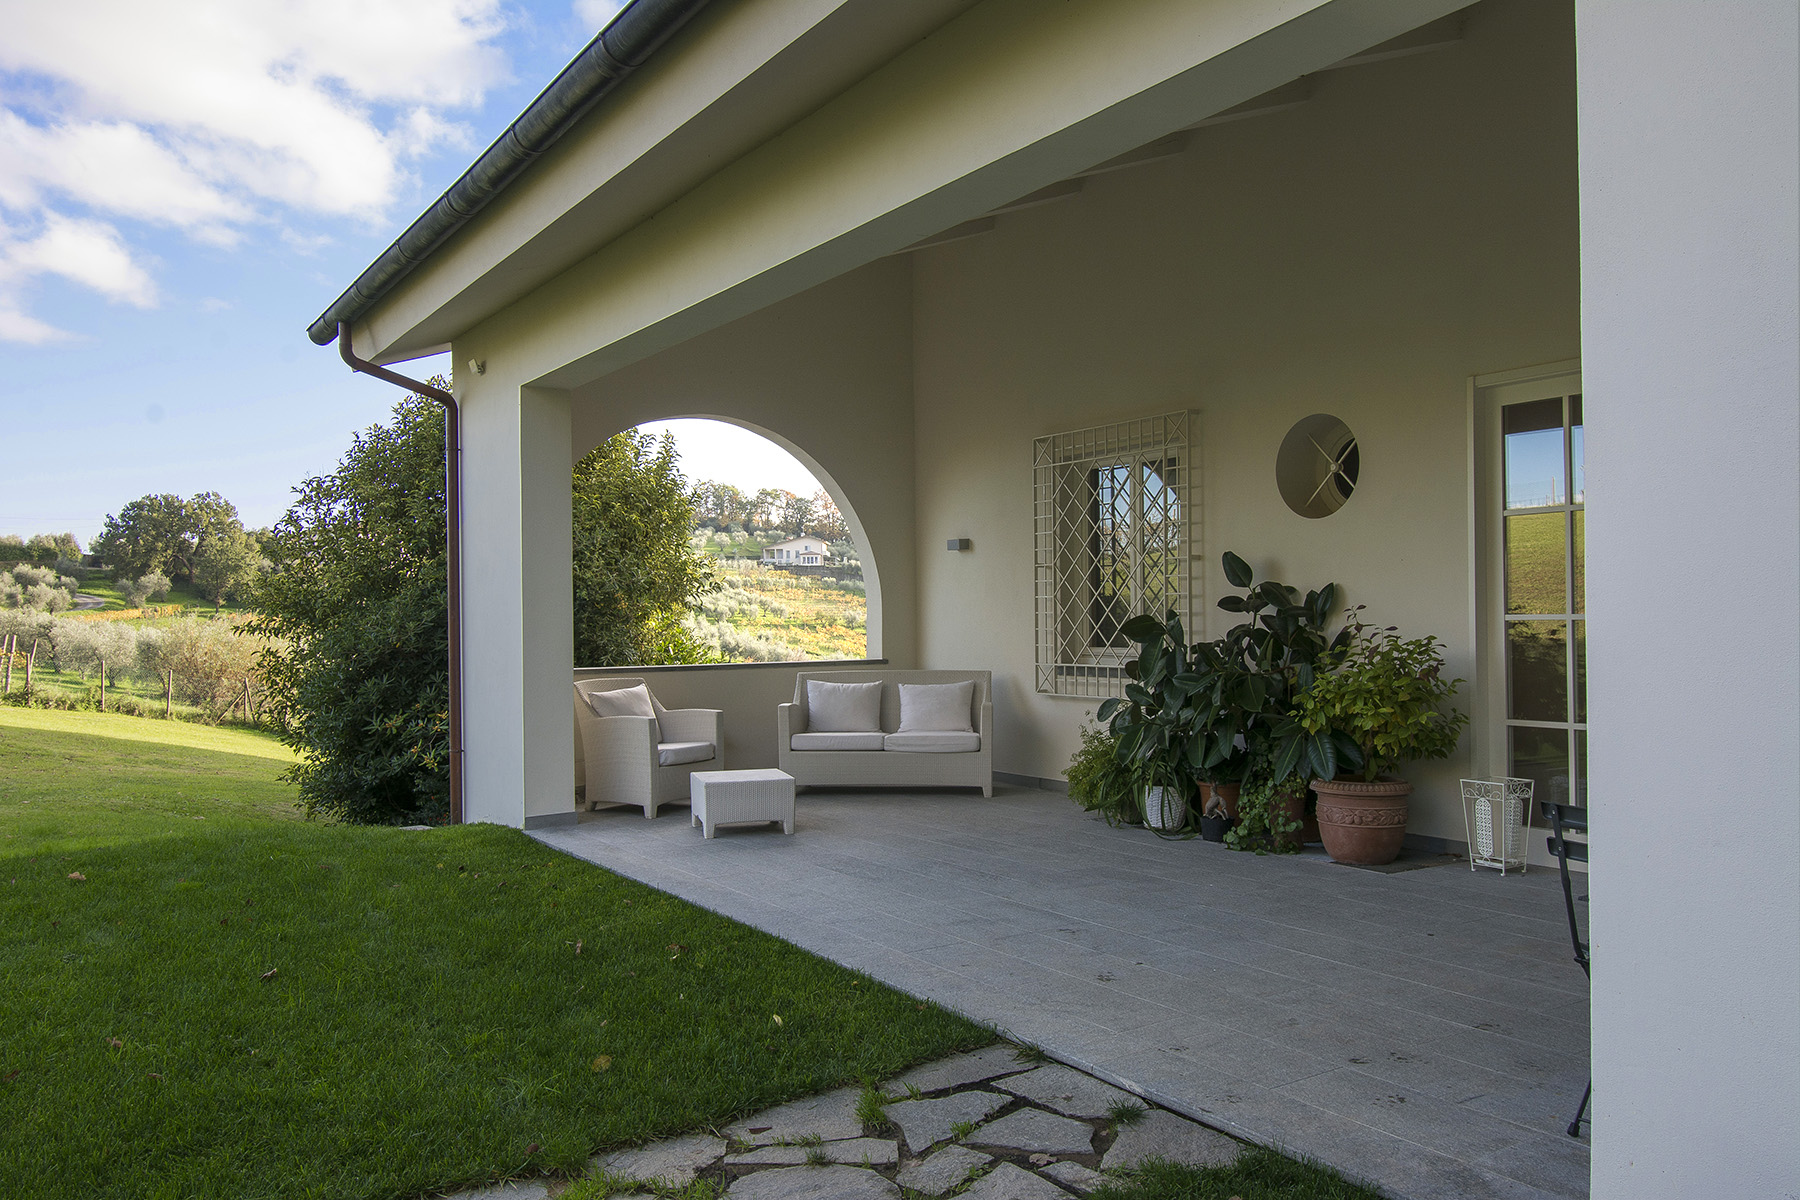 Villa in Vendita a Lucca: 5 locali, 470 mq - Foto 29